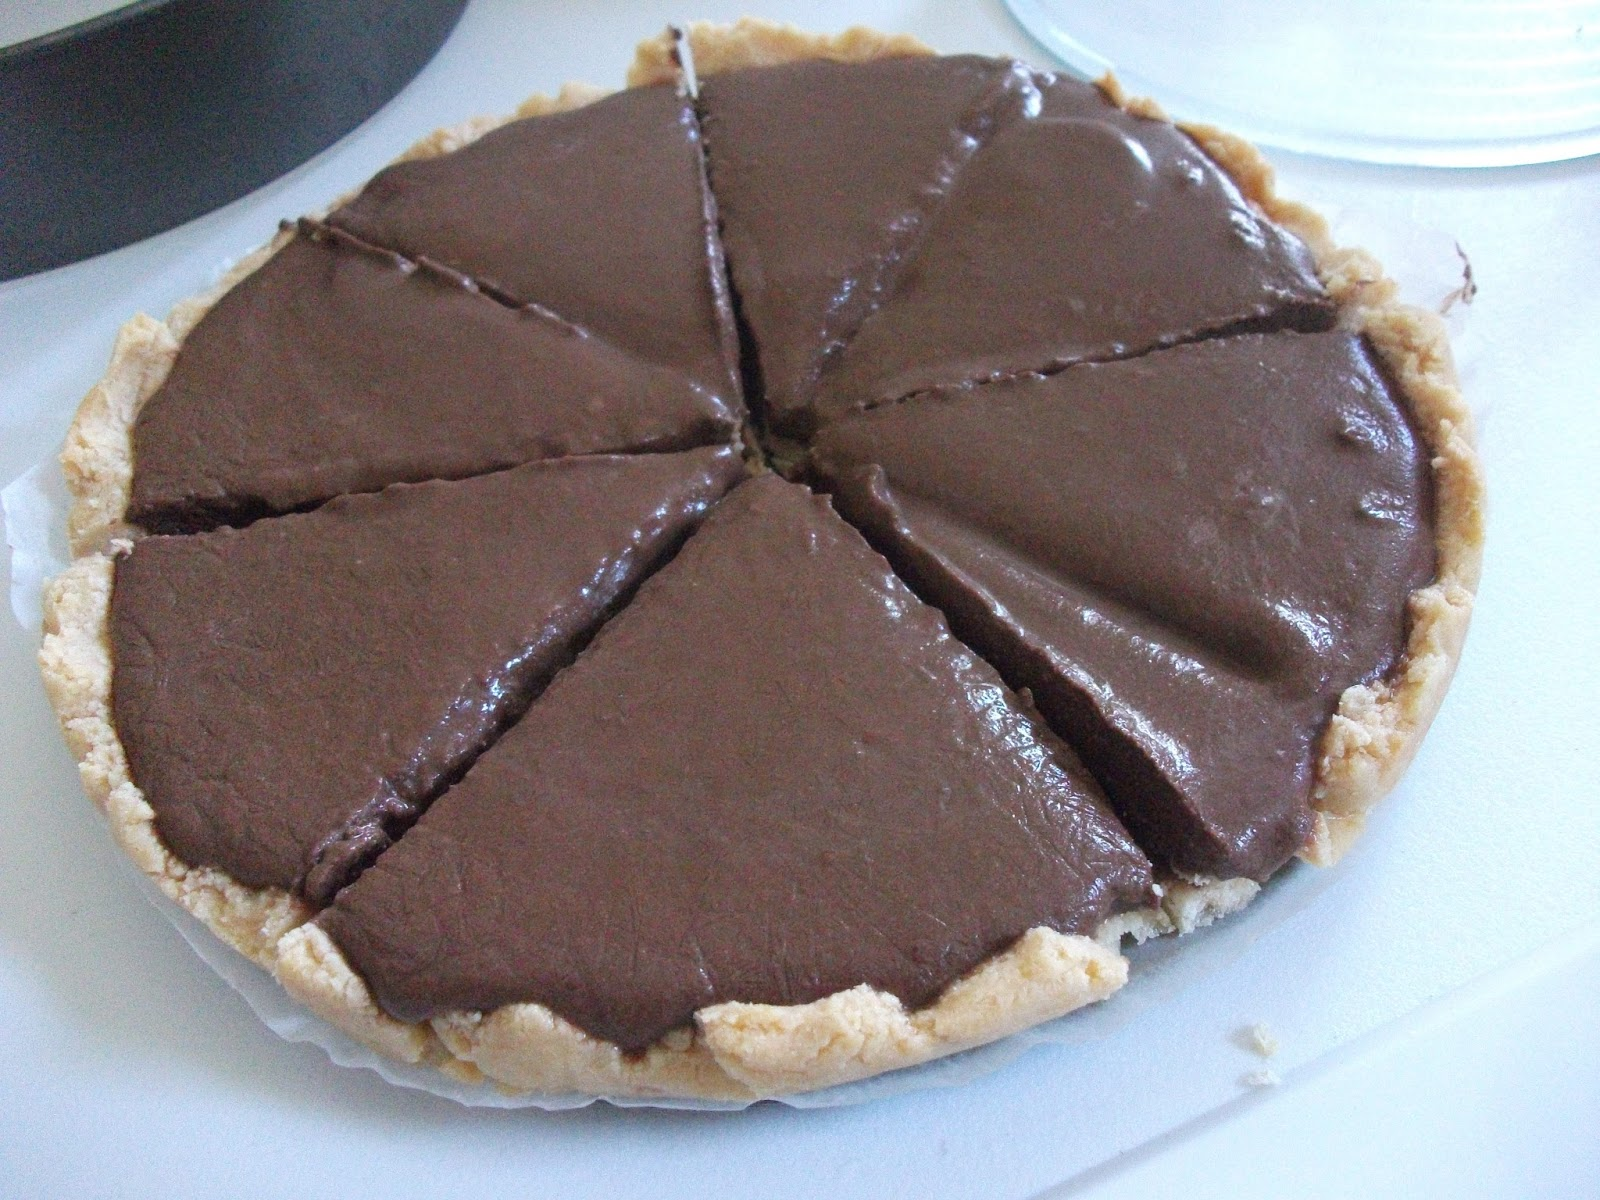 ... Milk Pie with Coconut Flour Crust (Gluten free, egg free, dairy free